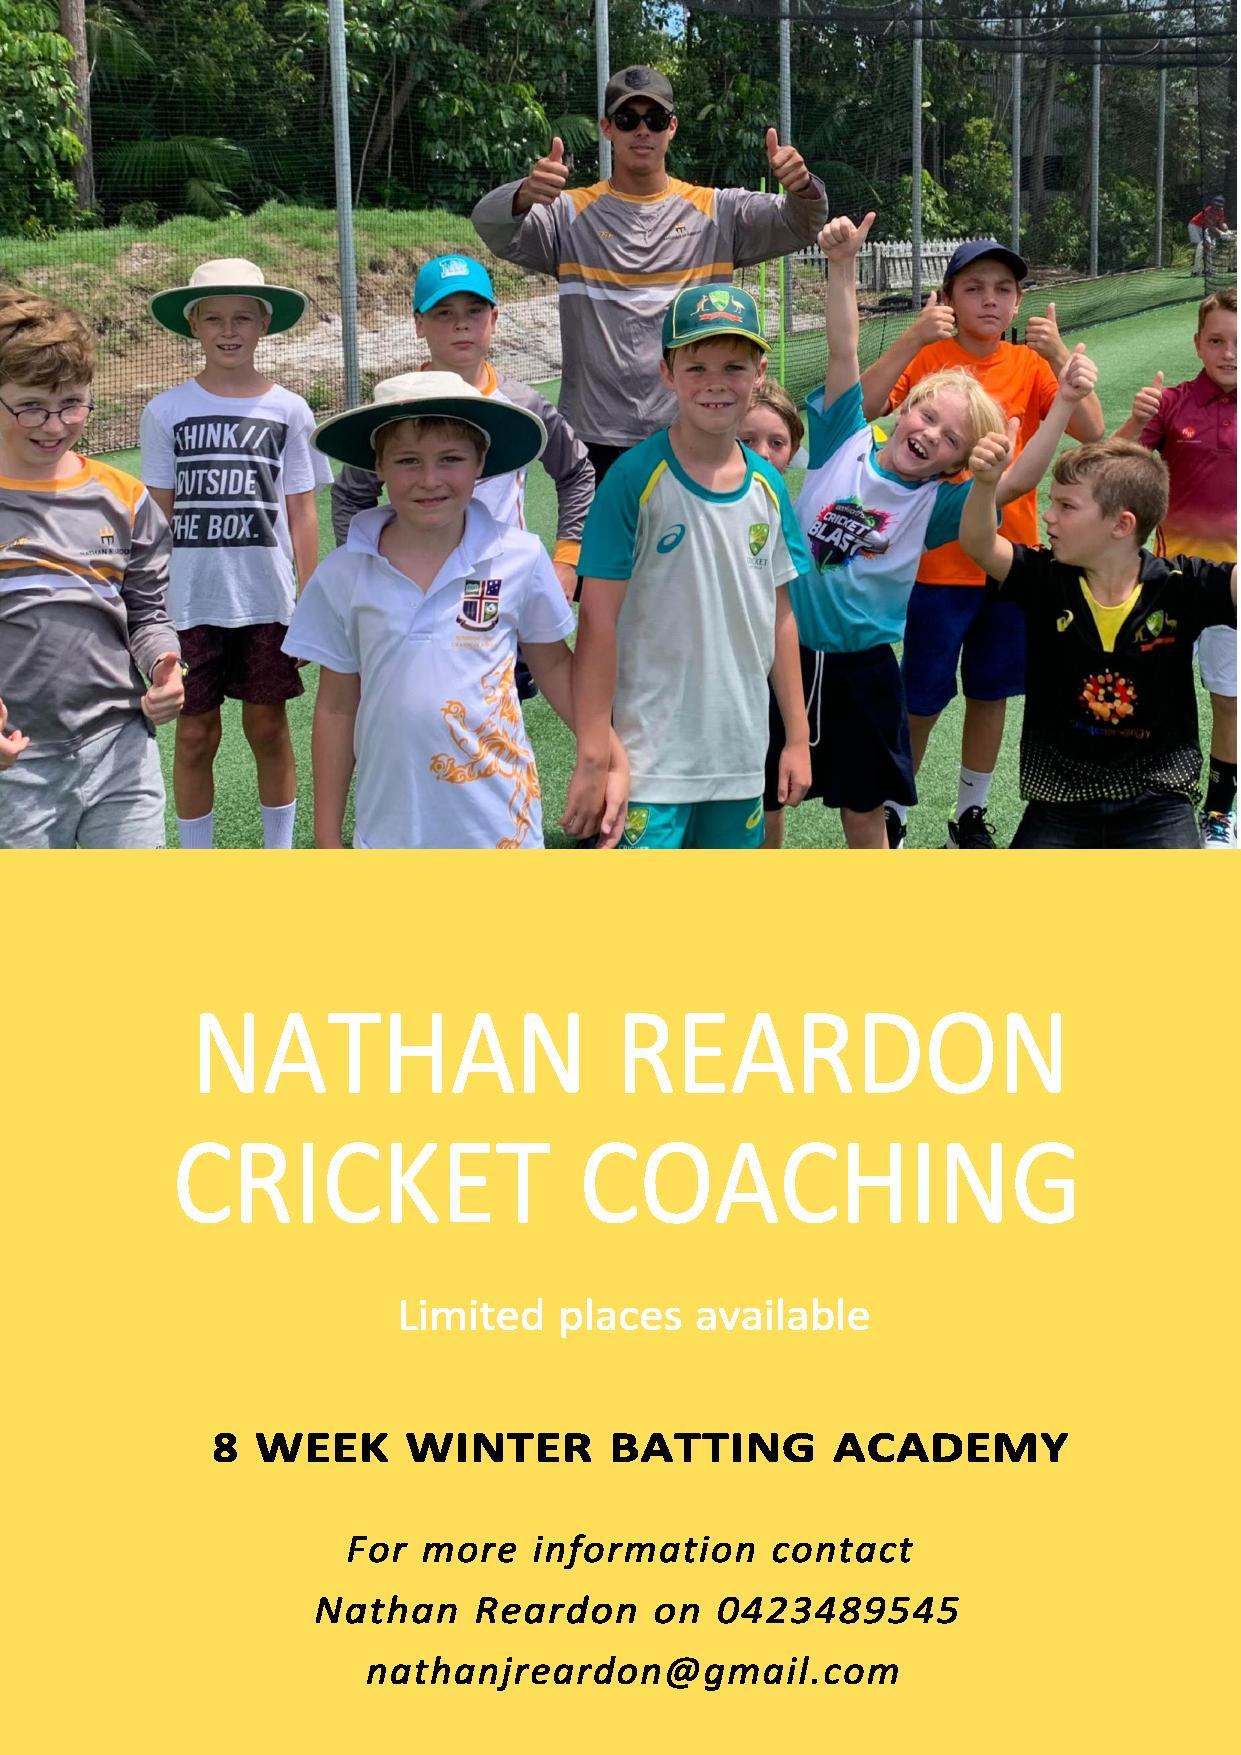 Nathan Reardon Cricket Coaching Winter batting academy2-page-001